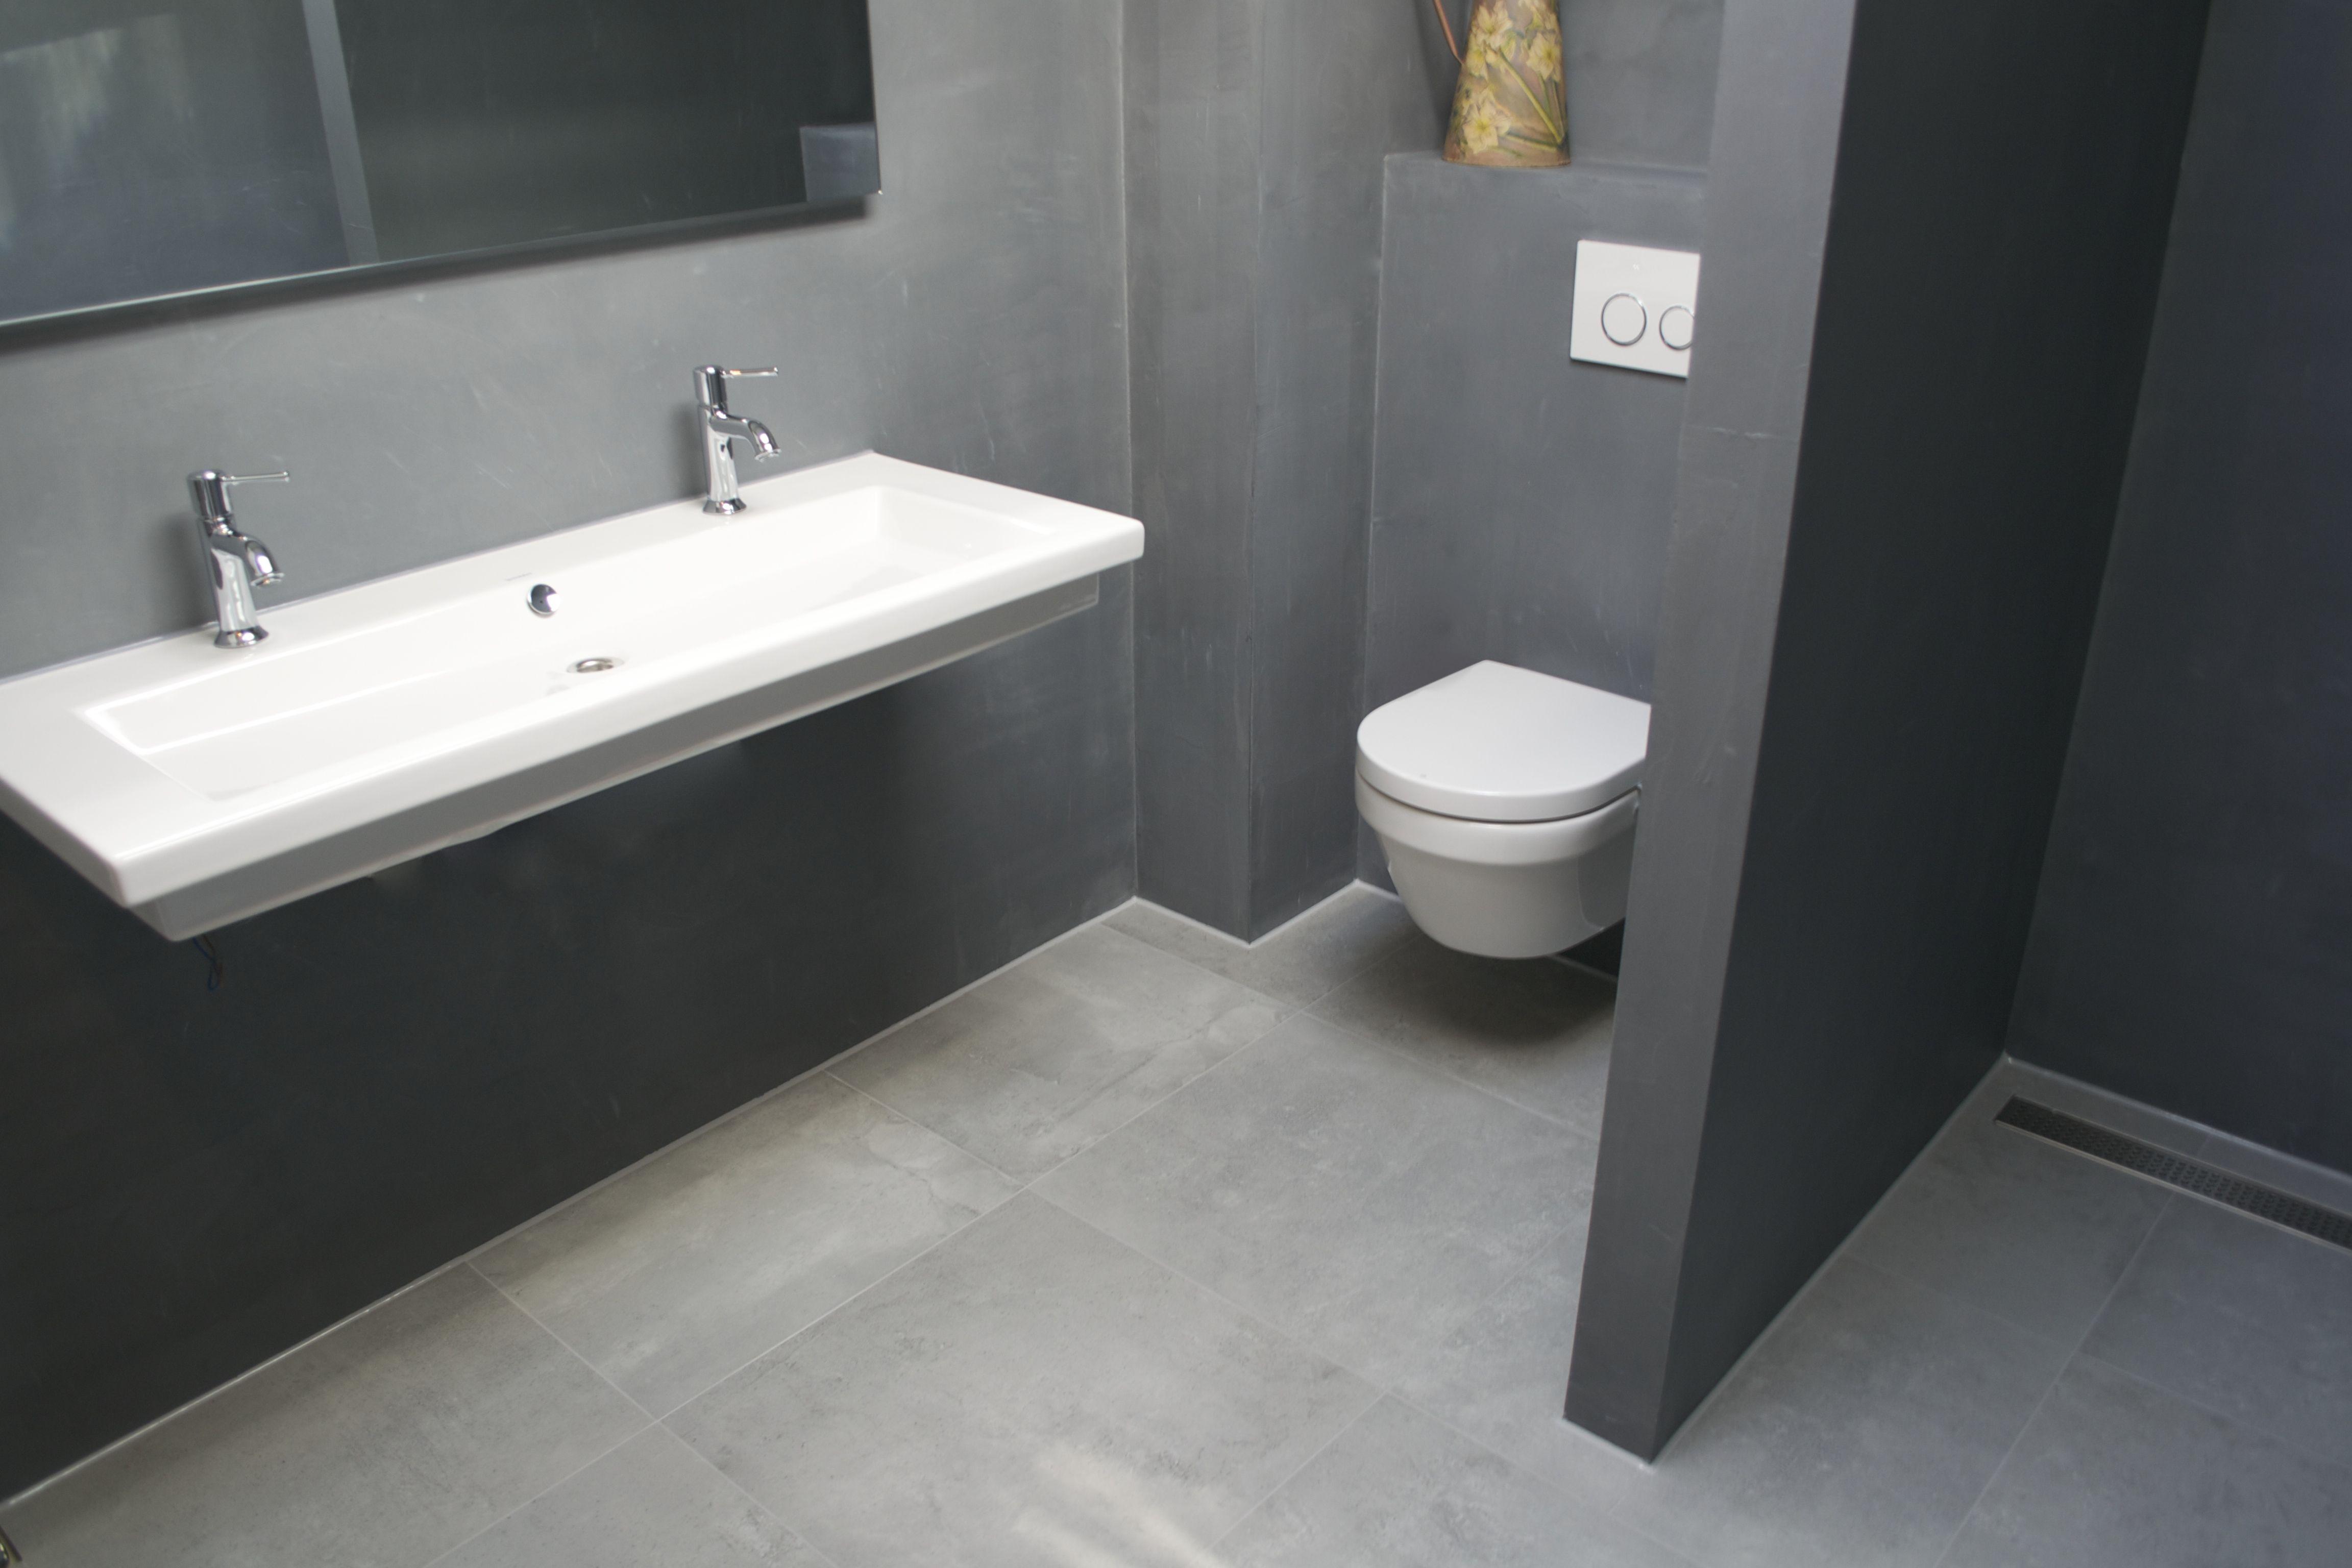 Beton Cire Kosten beton cire badkamer m jpg 4608 3072 nieuwbouwhuis